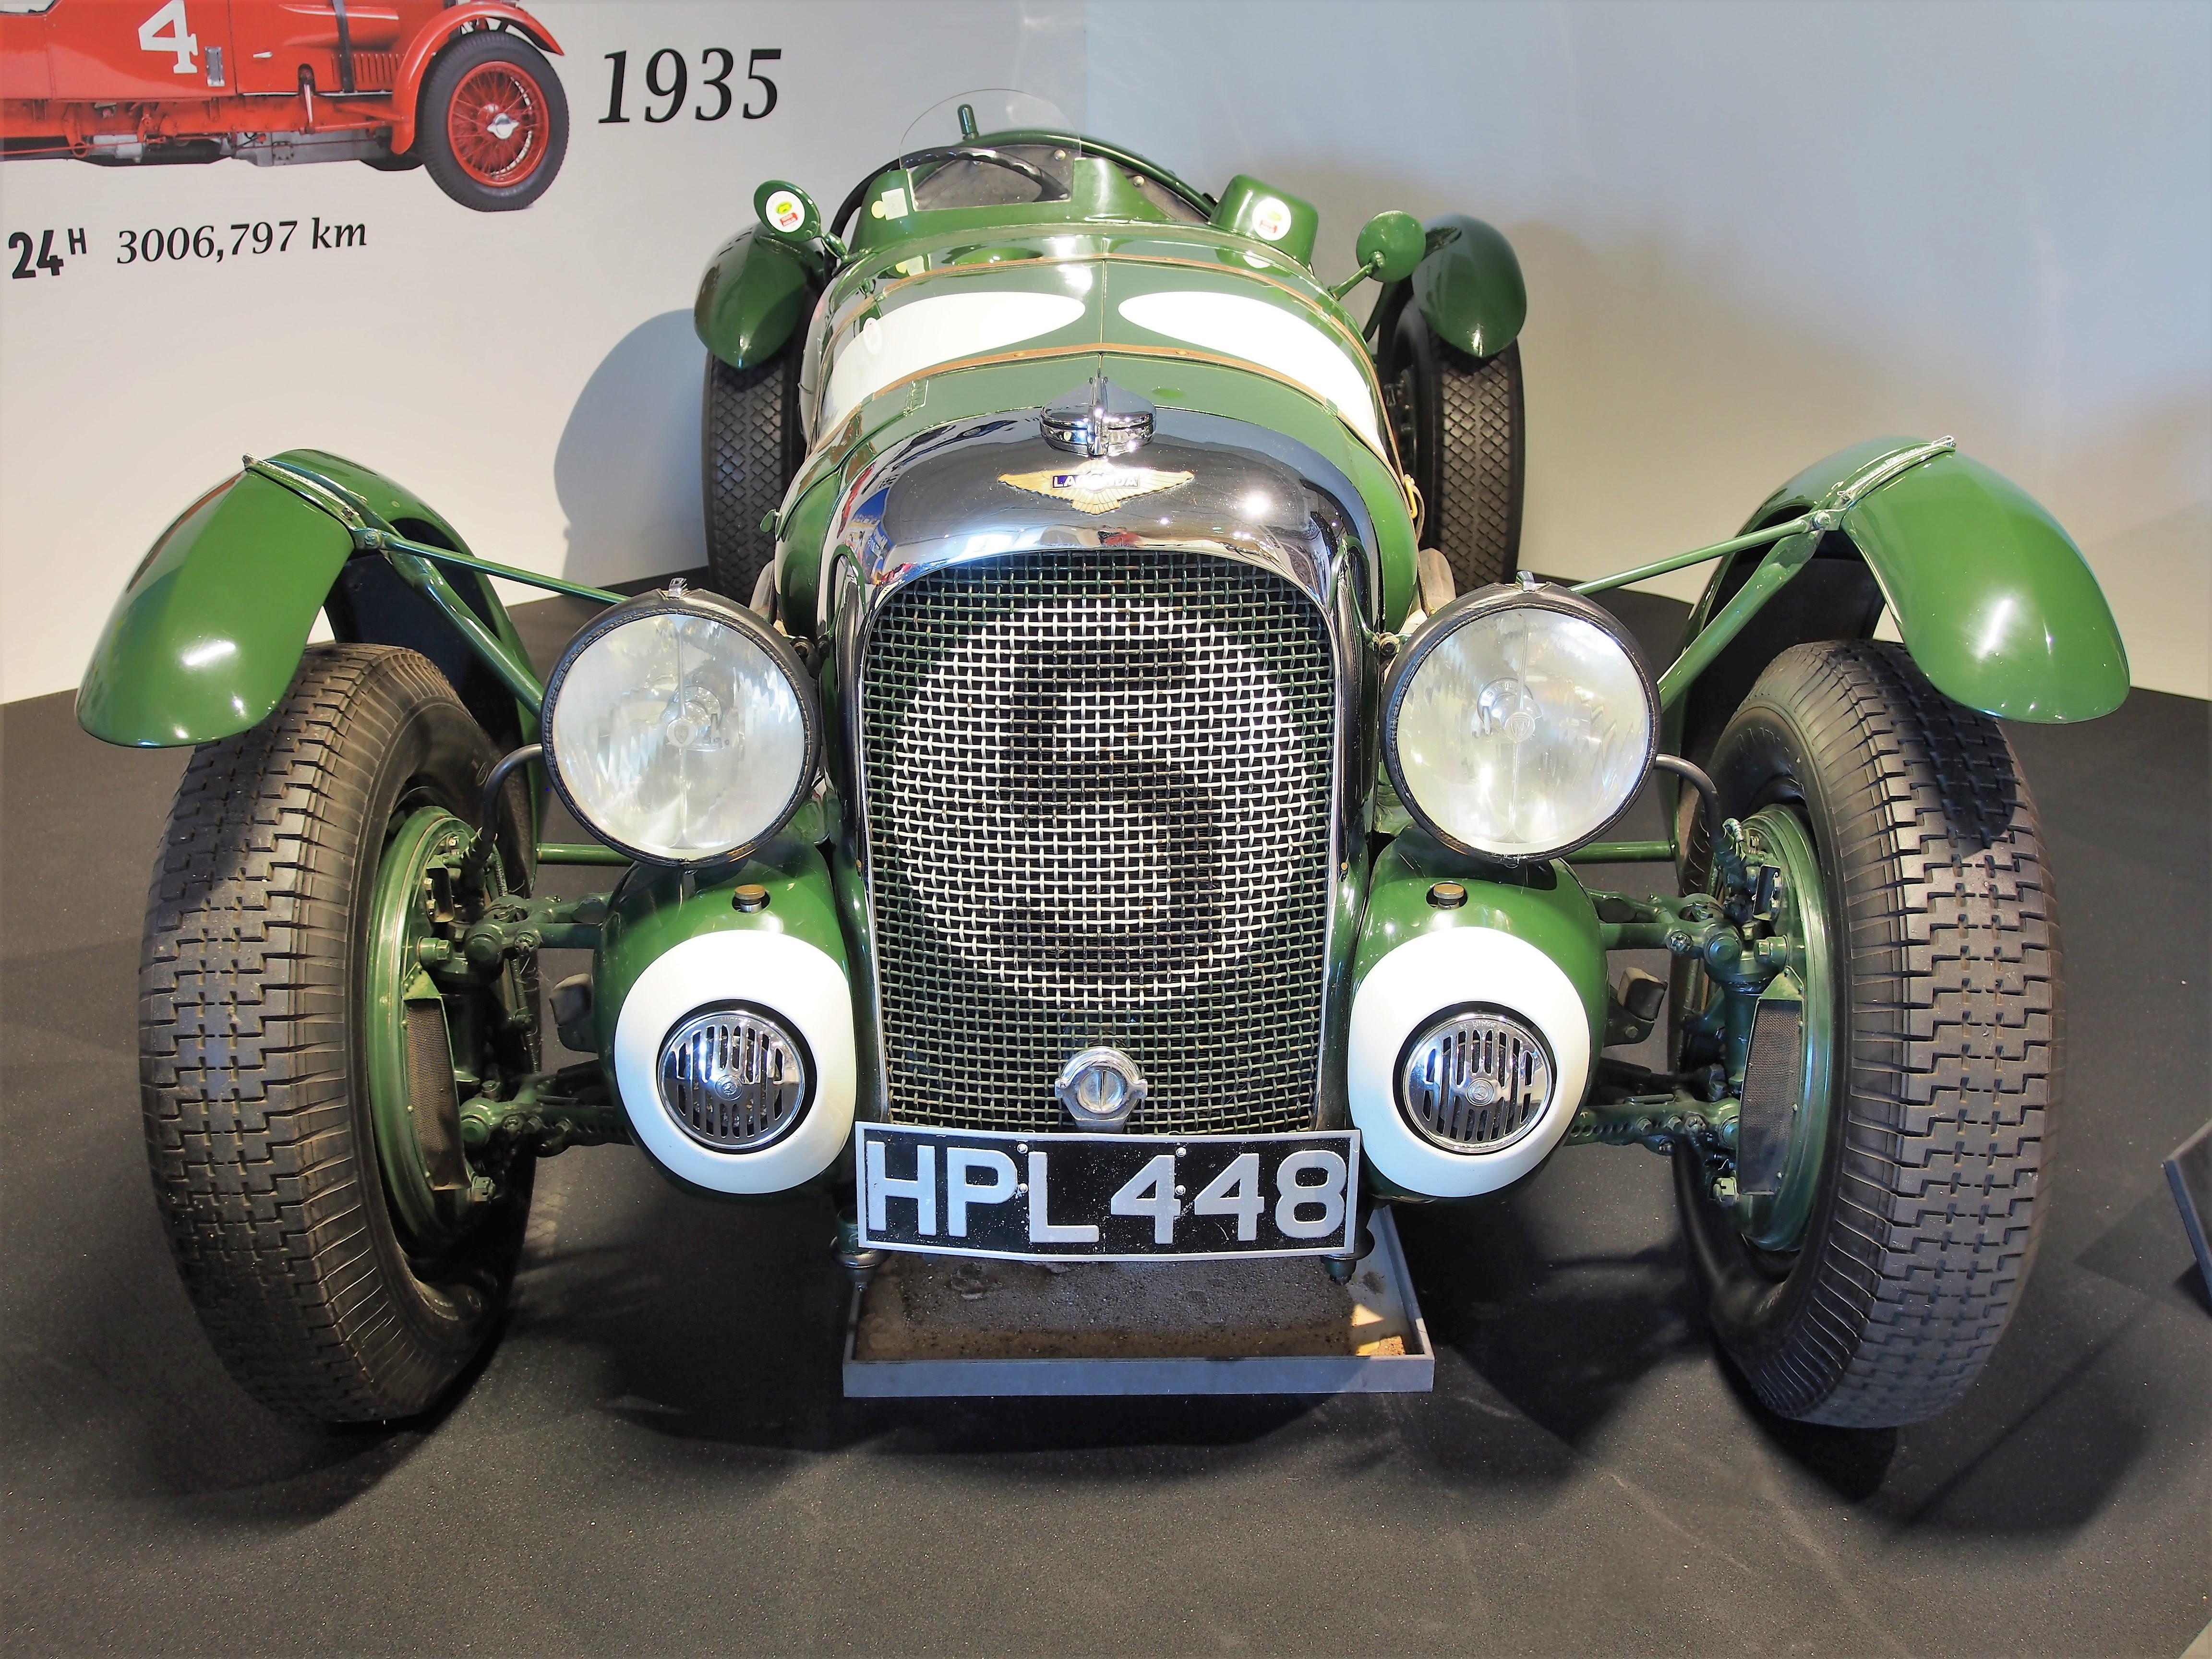 file 1939 lagonda v12 le mans works team car 4 5 litre 12 cylinder rh commons wikimedia org